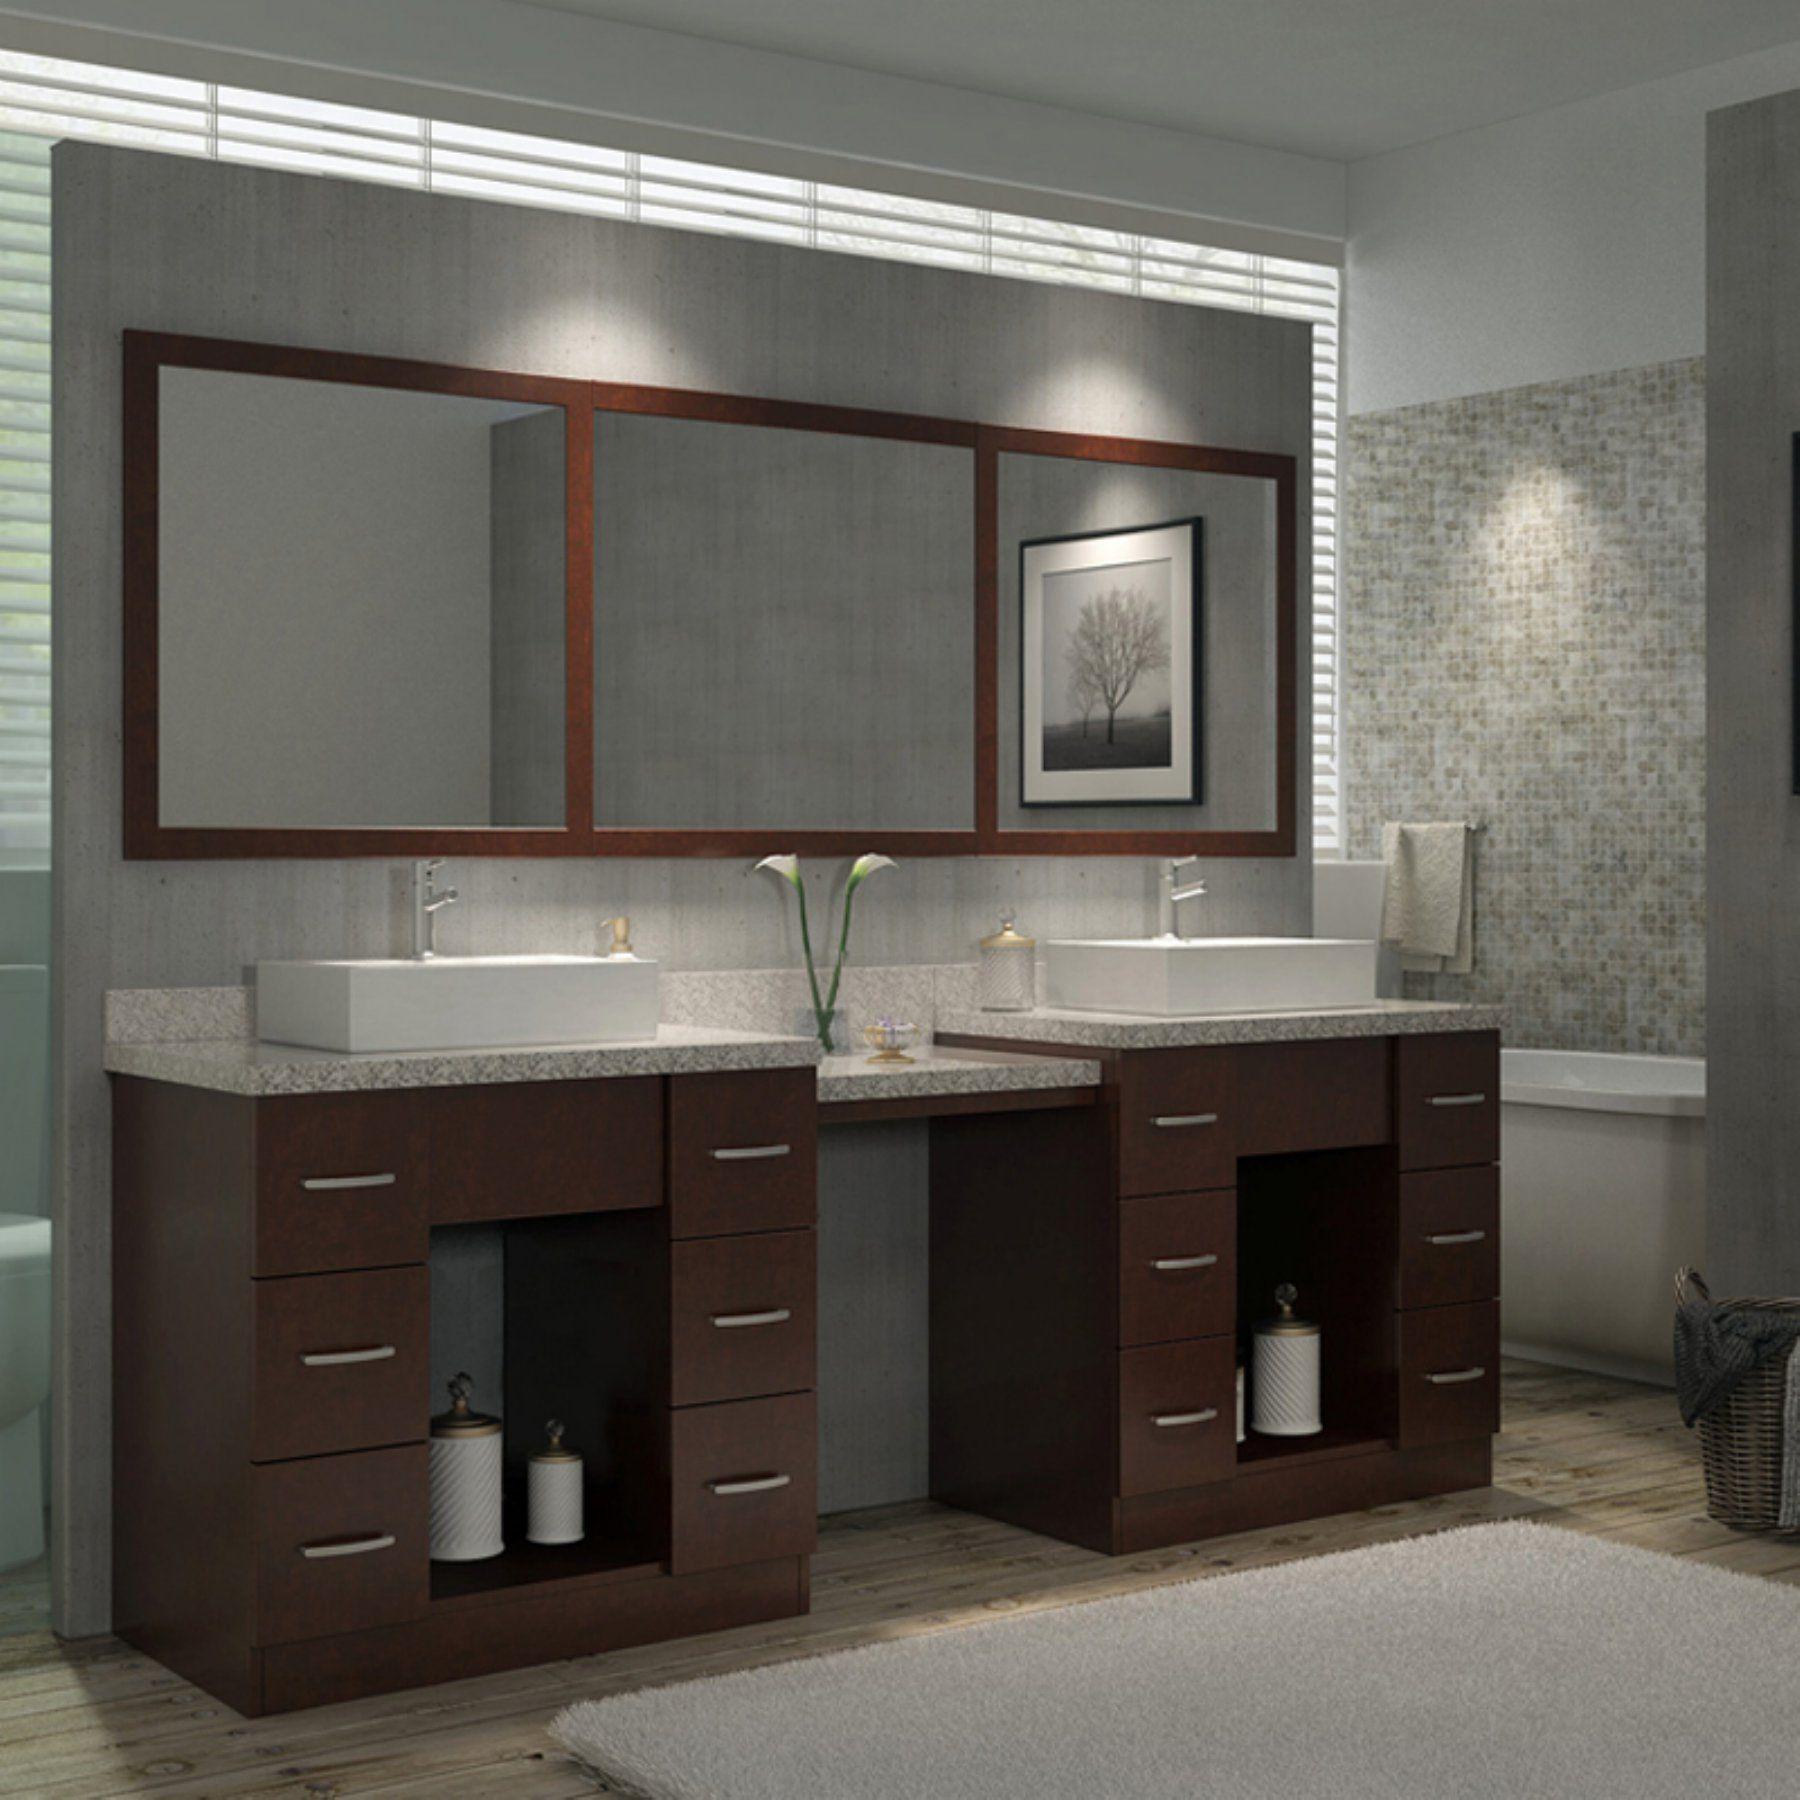 50 Bathroom Vanity Ideas Ingeniously Prettify You And Your Bathroom Modern Bathroom Renovations Bathroom Vanity Vanity Sink [ 1800 x 1800 Pixel ]